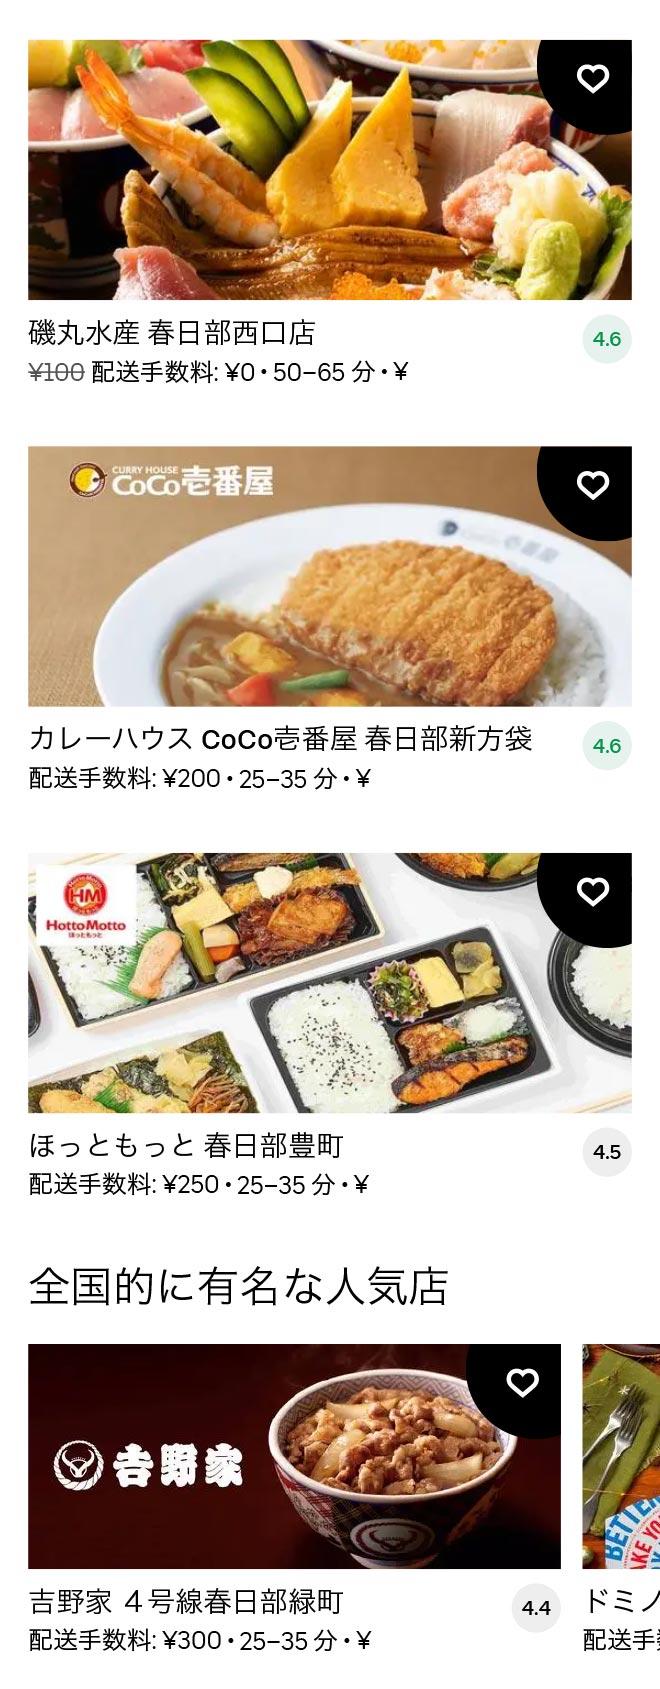 Kasukabe menu 2101 03